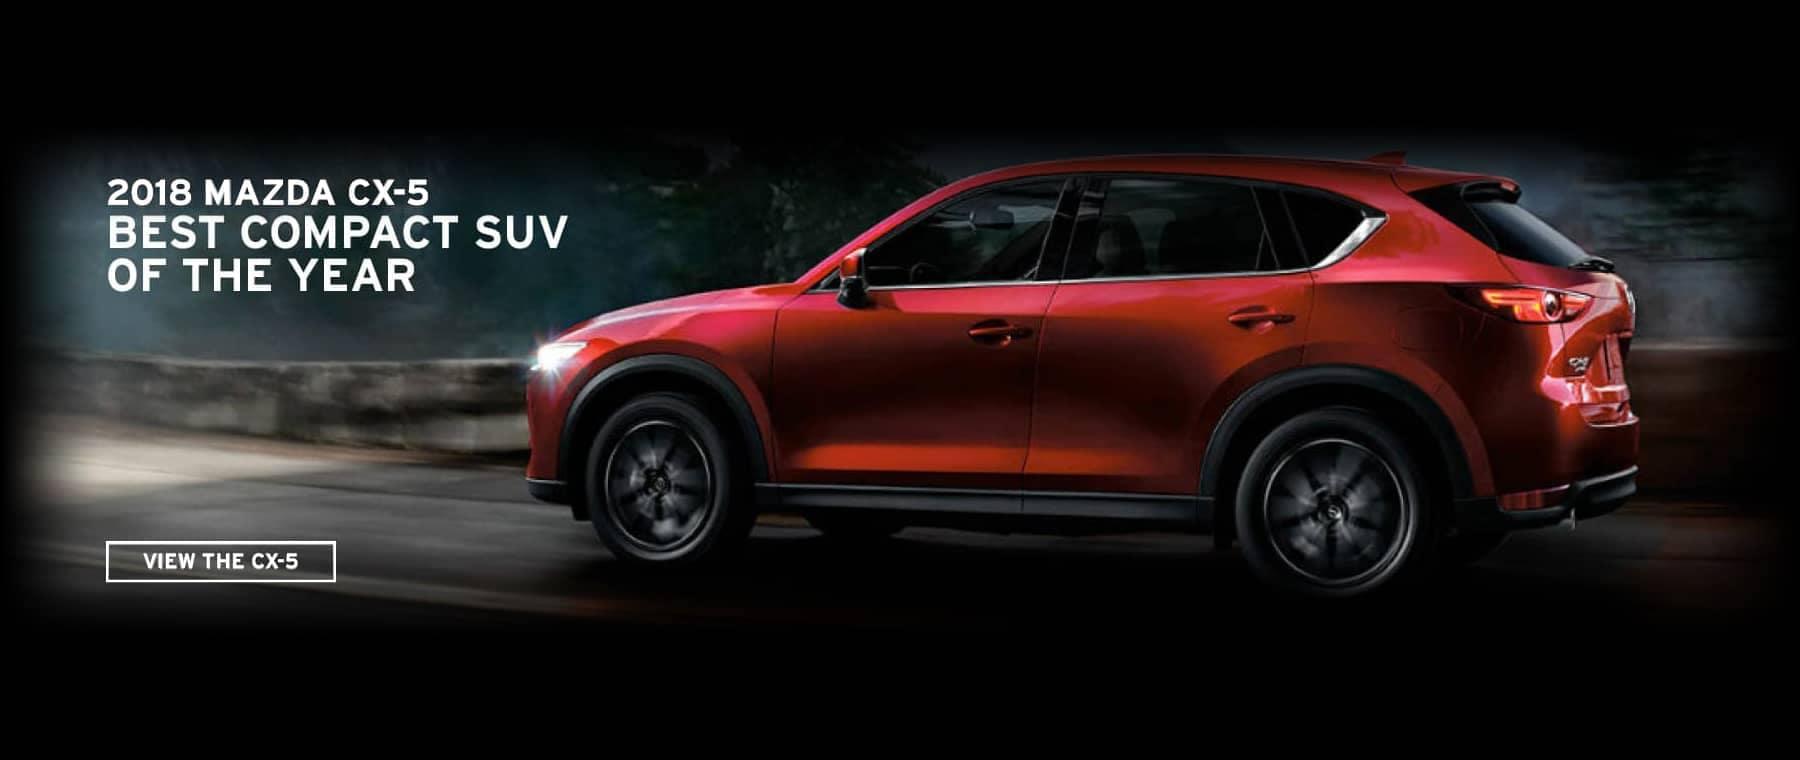 Mazda CX-5 Award